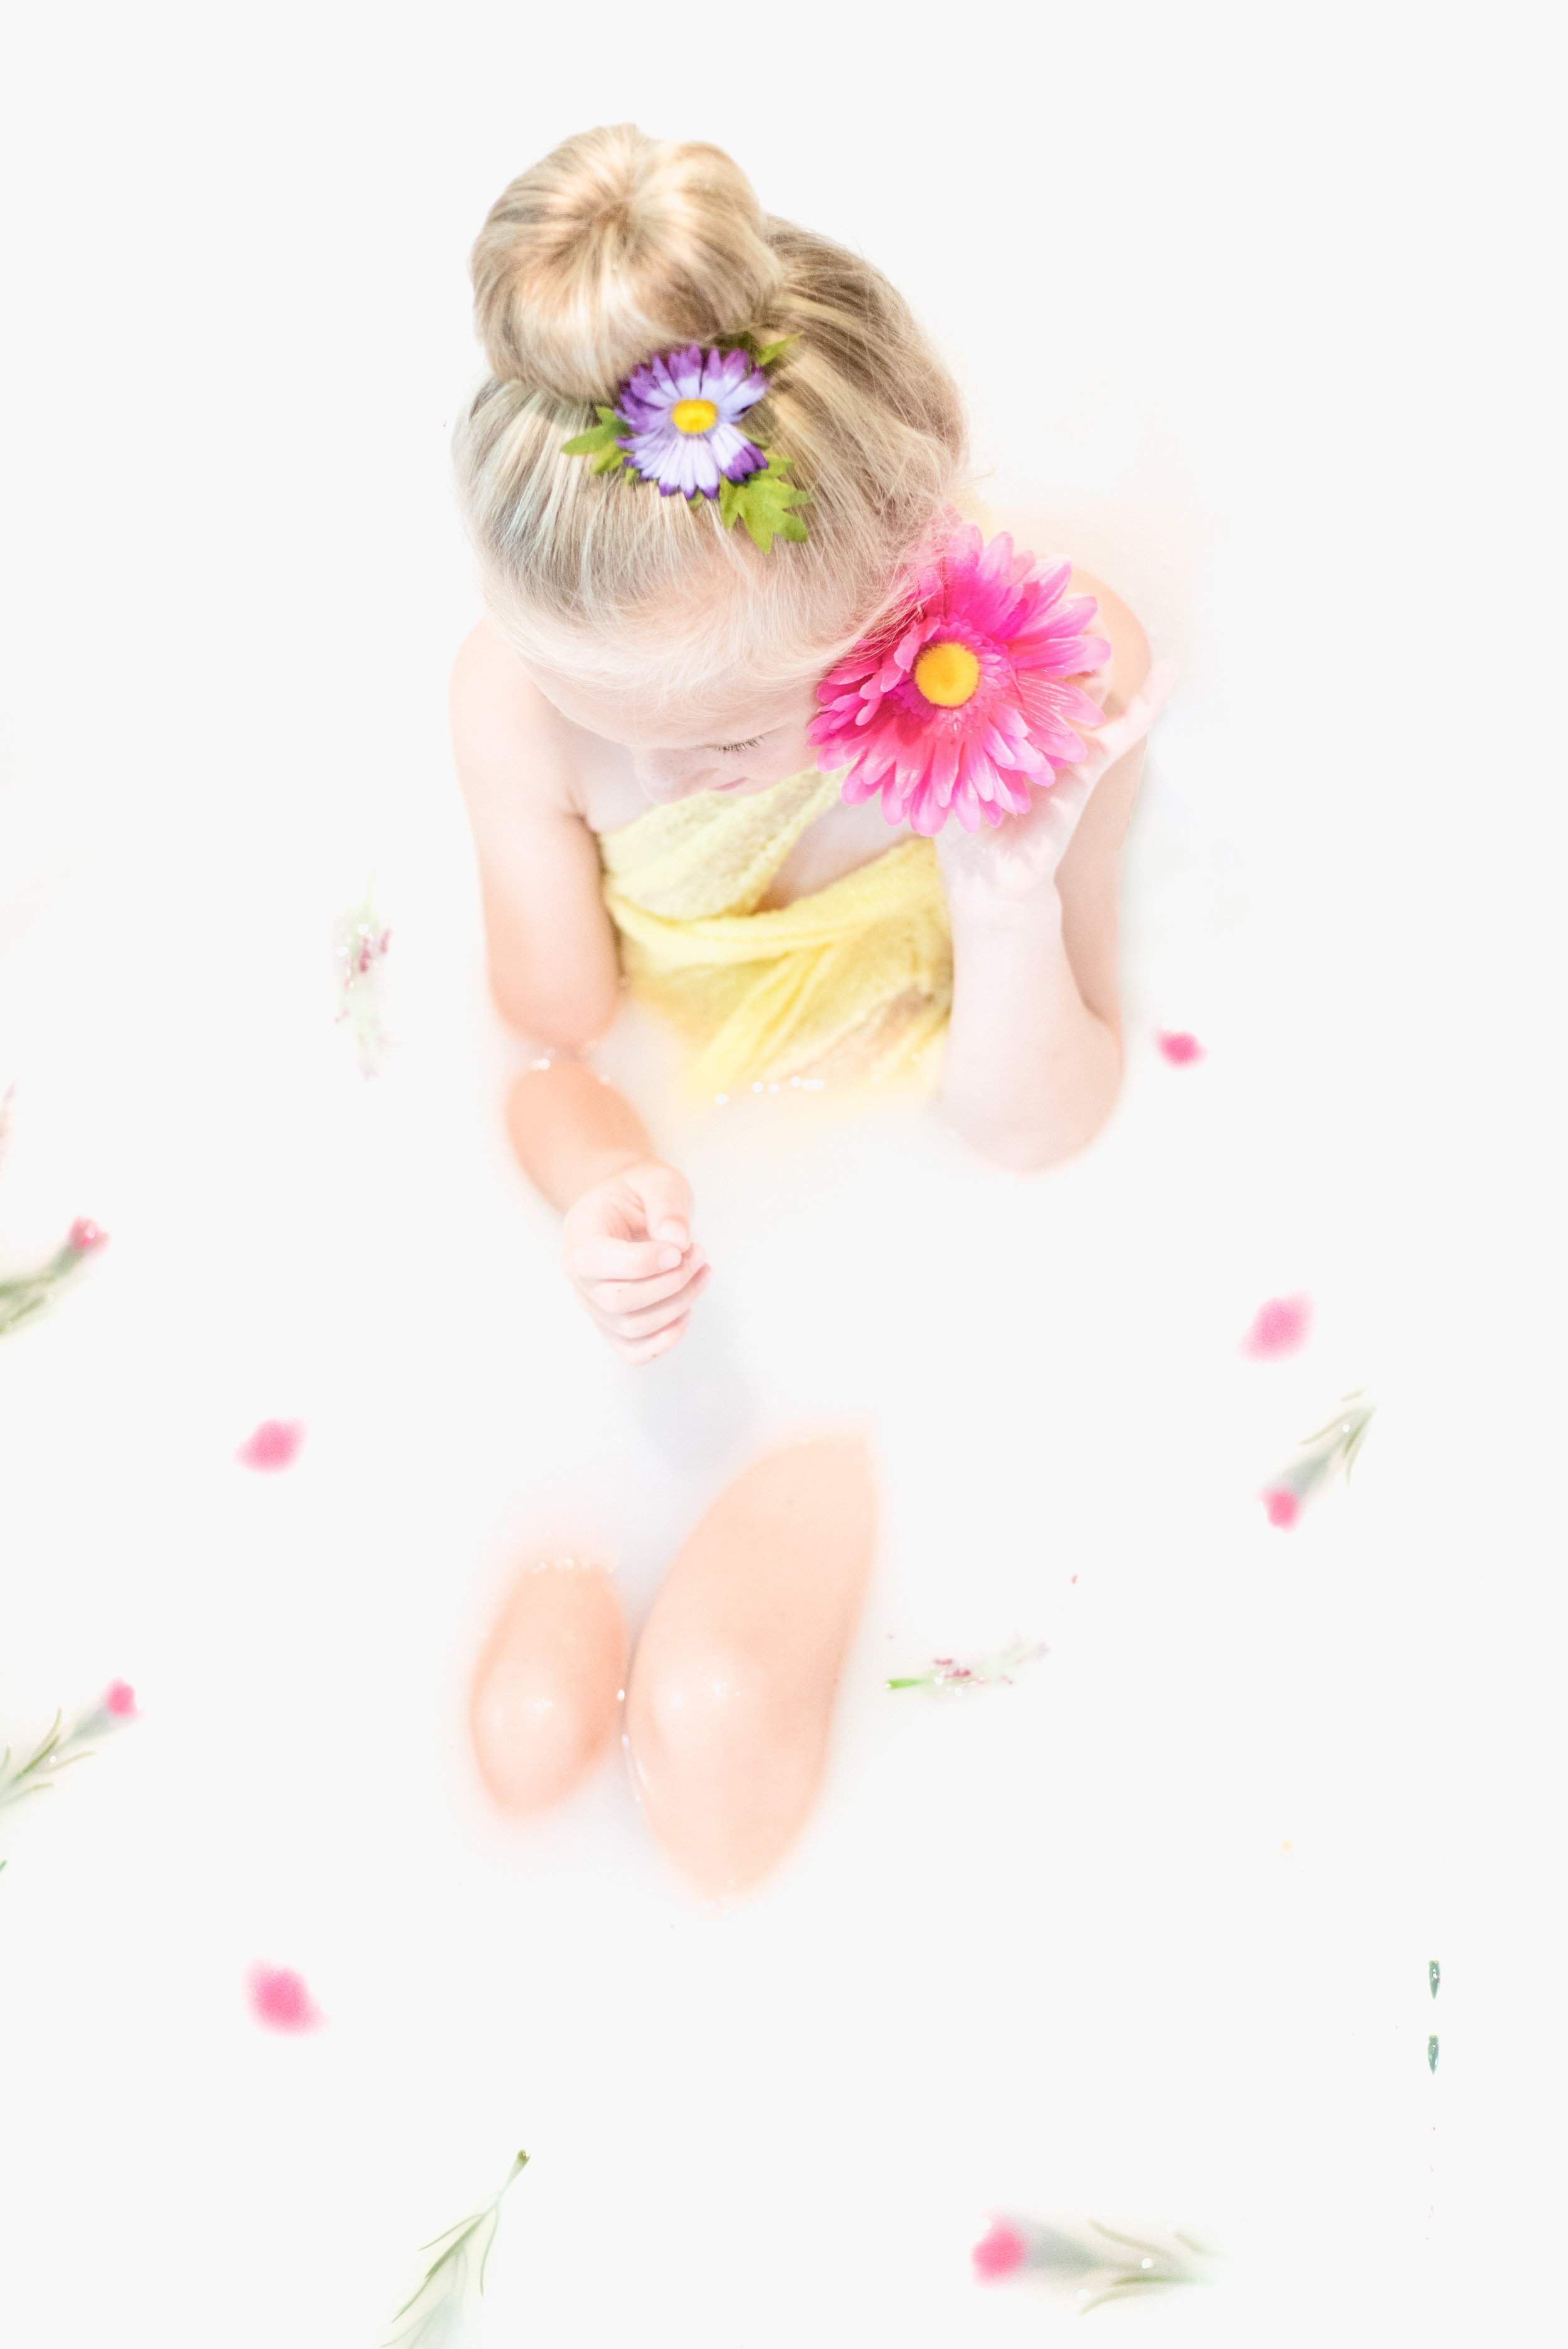 20170423capecoralfamilyandchildrenphotographer001FB.jpg